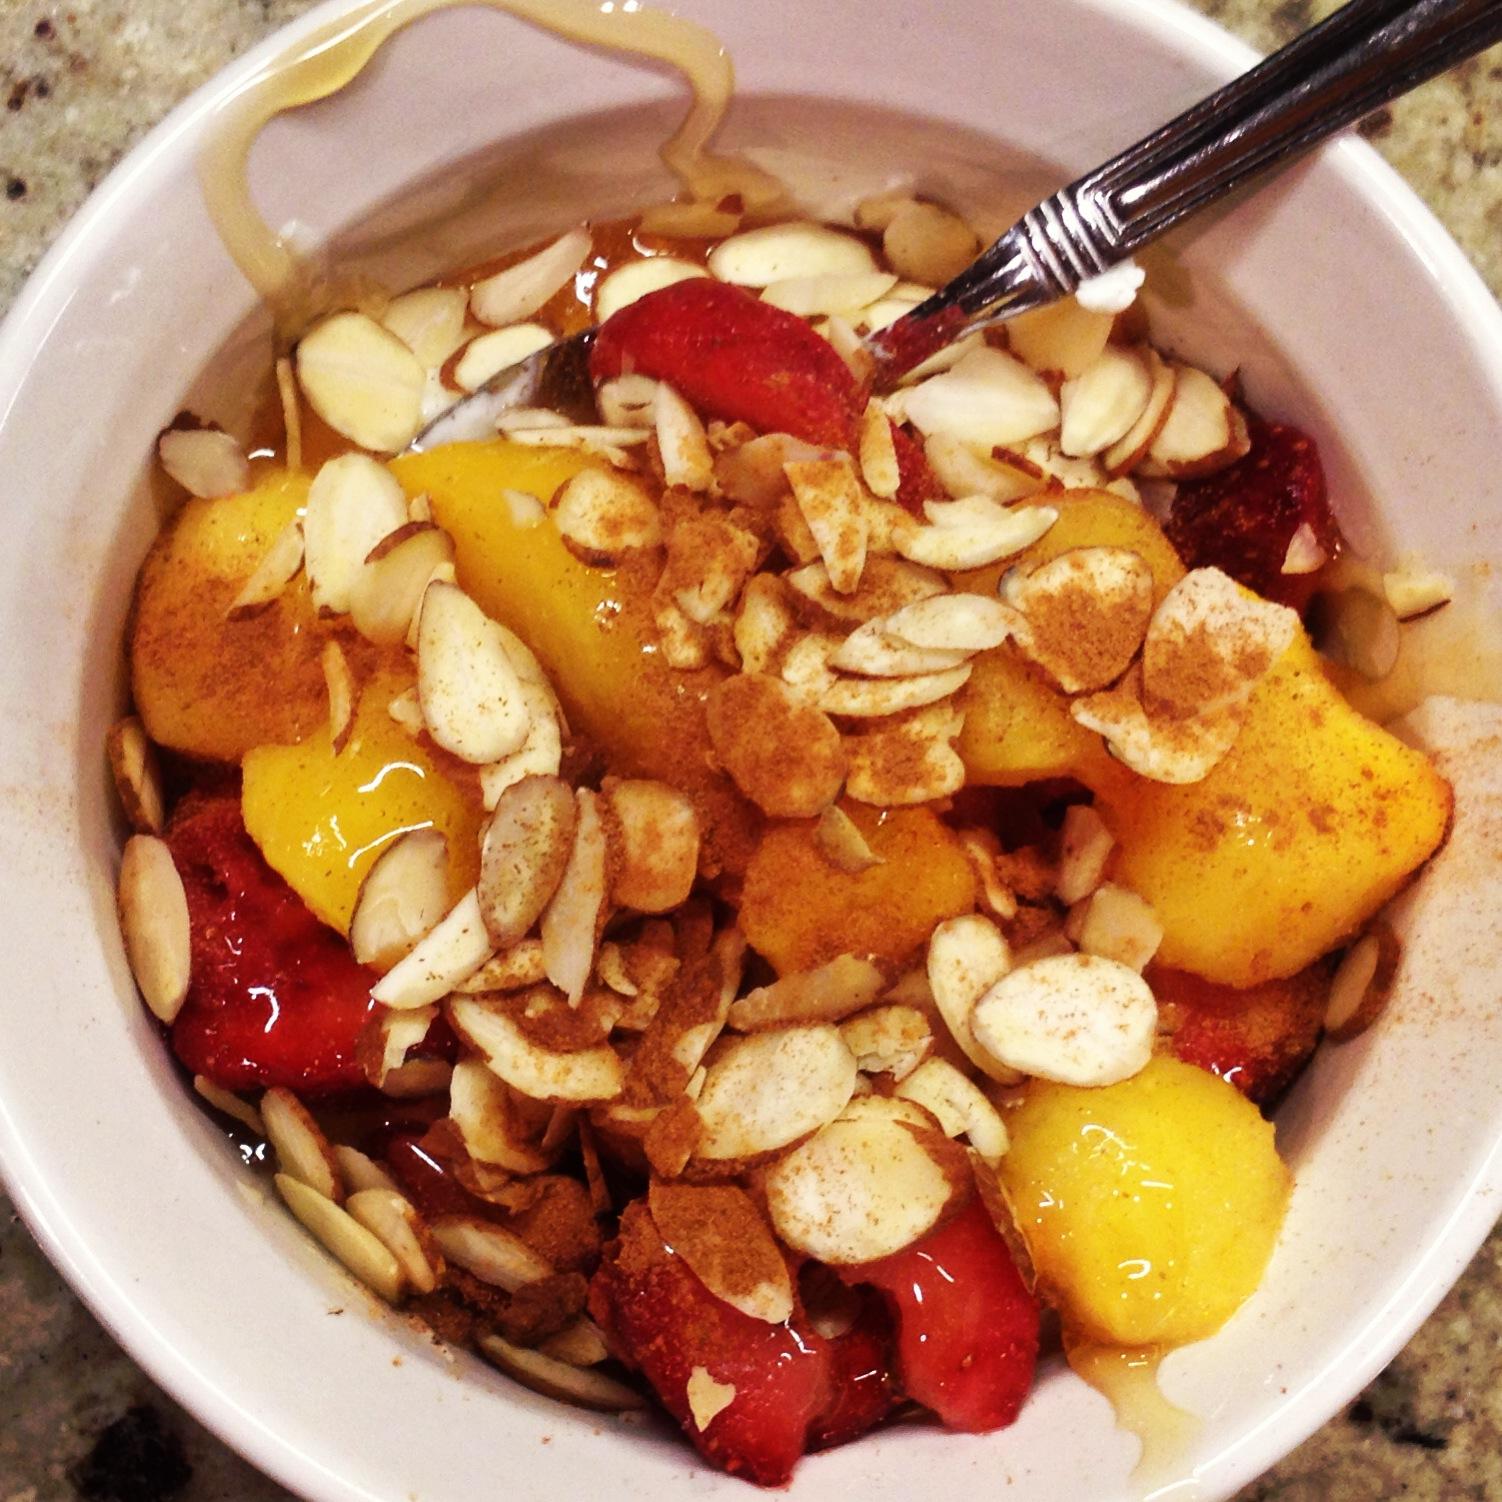 greek yogurt fruit snack